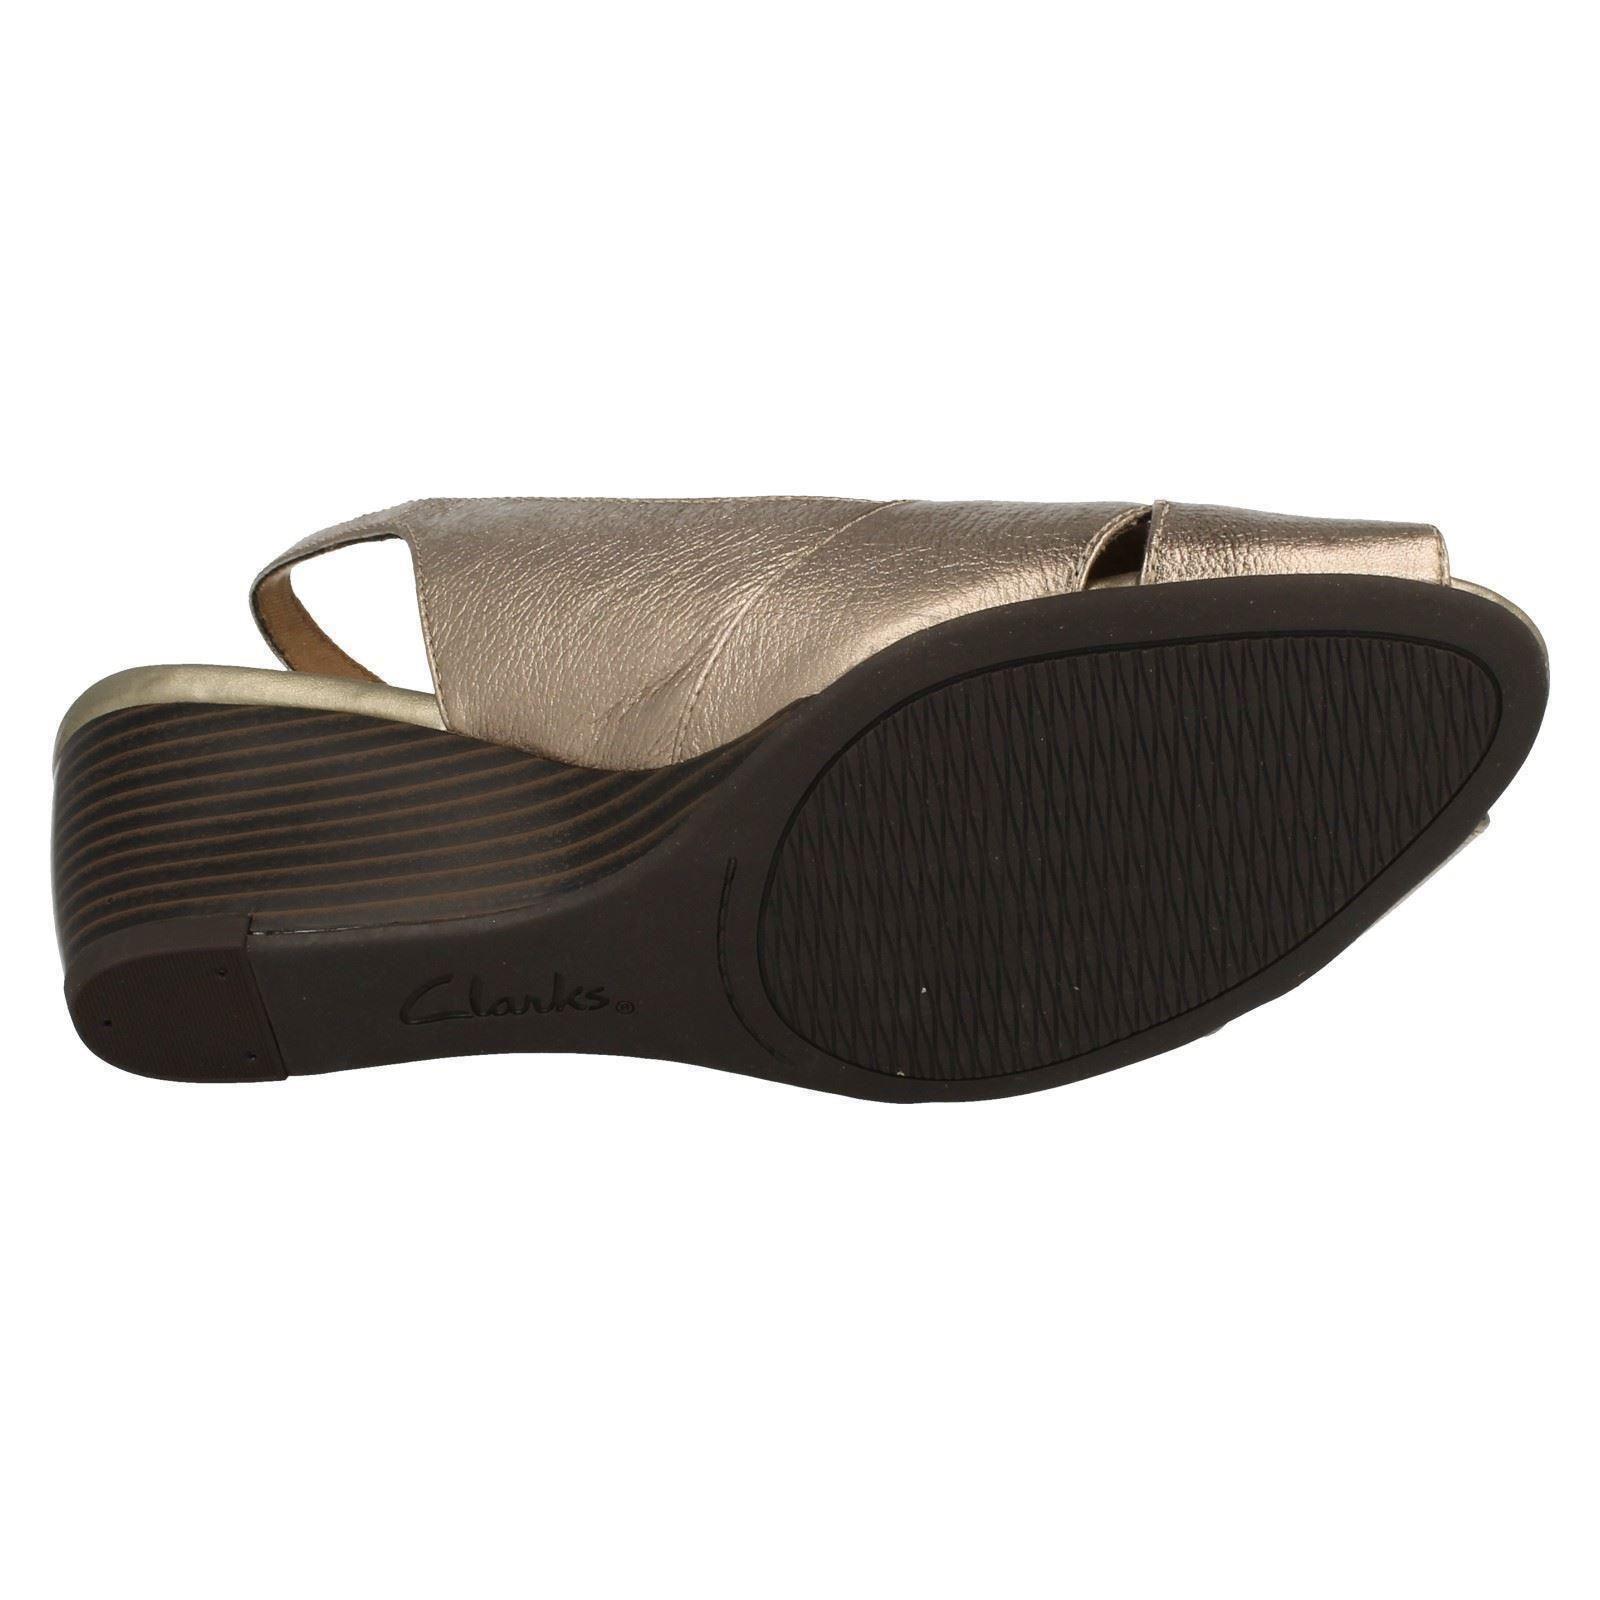 donna-CLARKS-CINTURINO-SANDALI-039-Brielle-colore-KAE-039